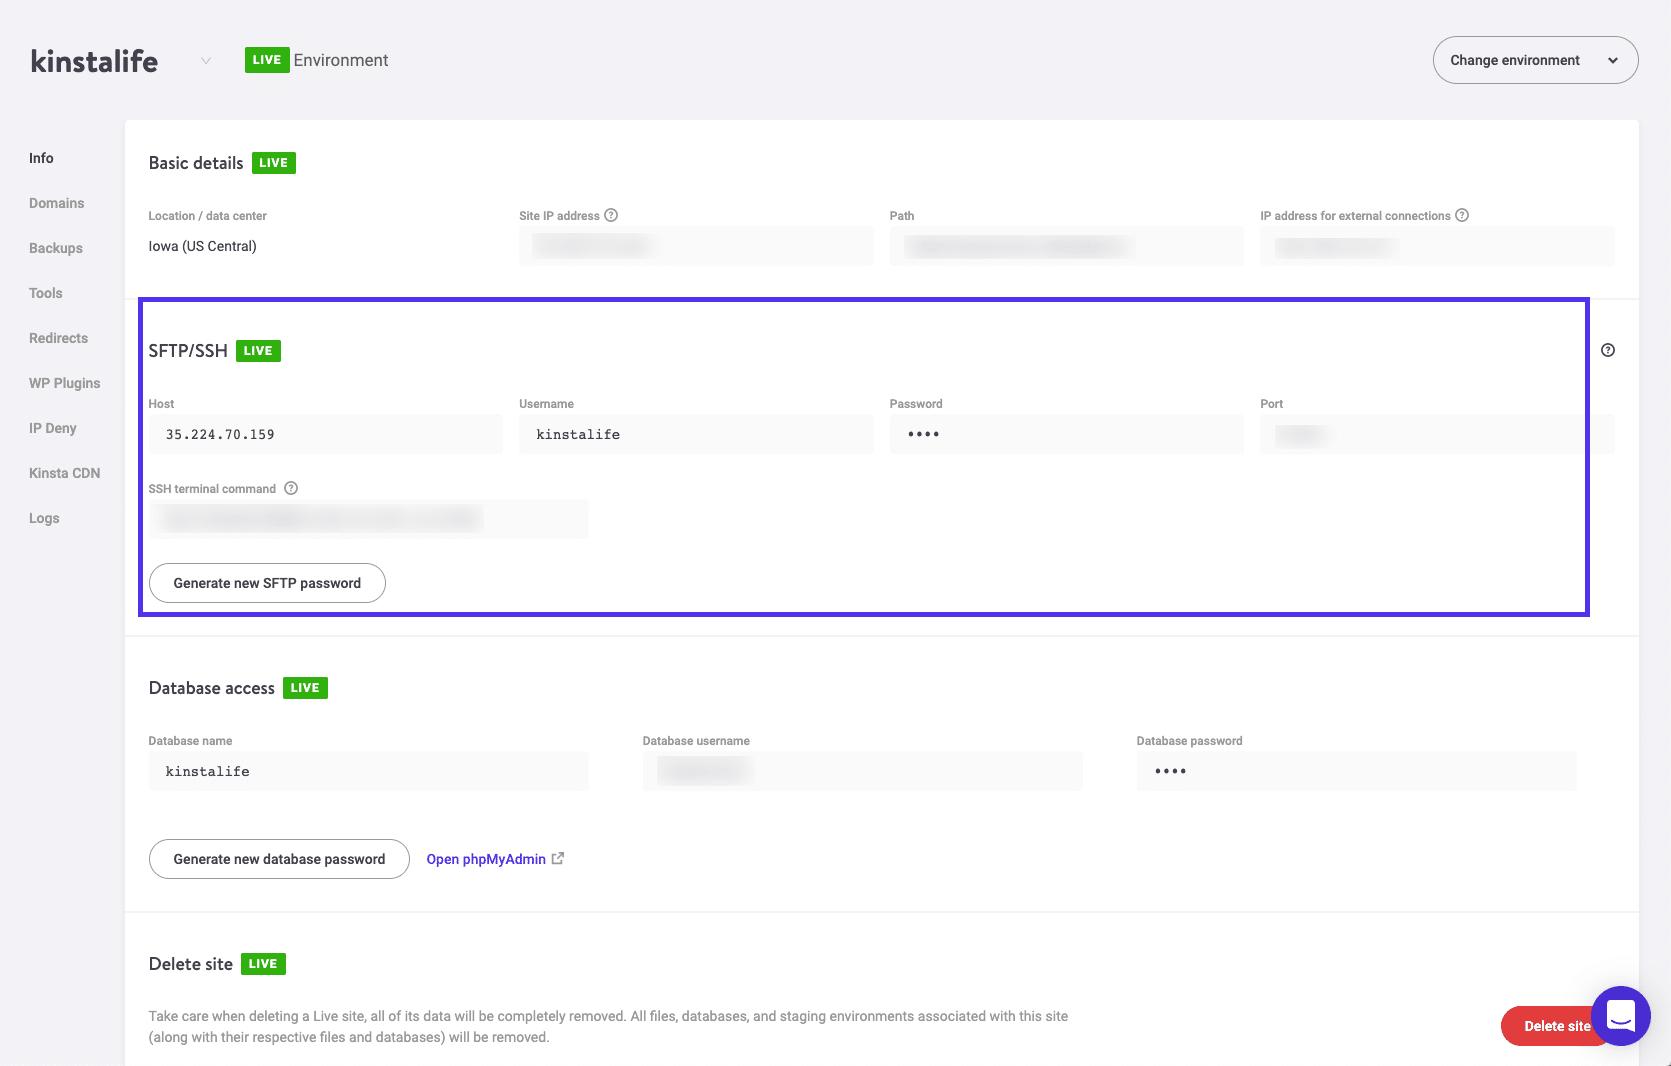 MyKinstaのログイン認証情報